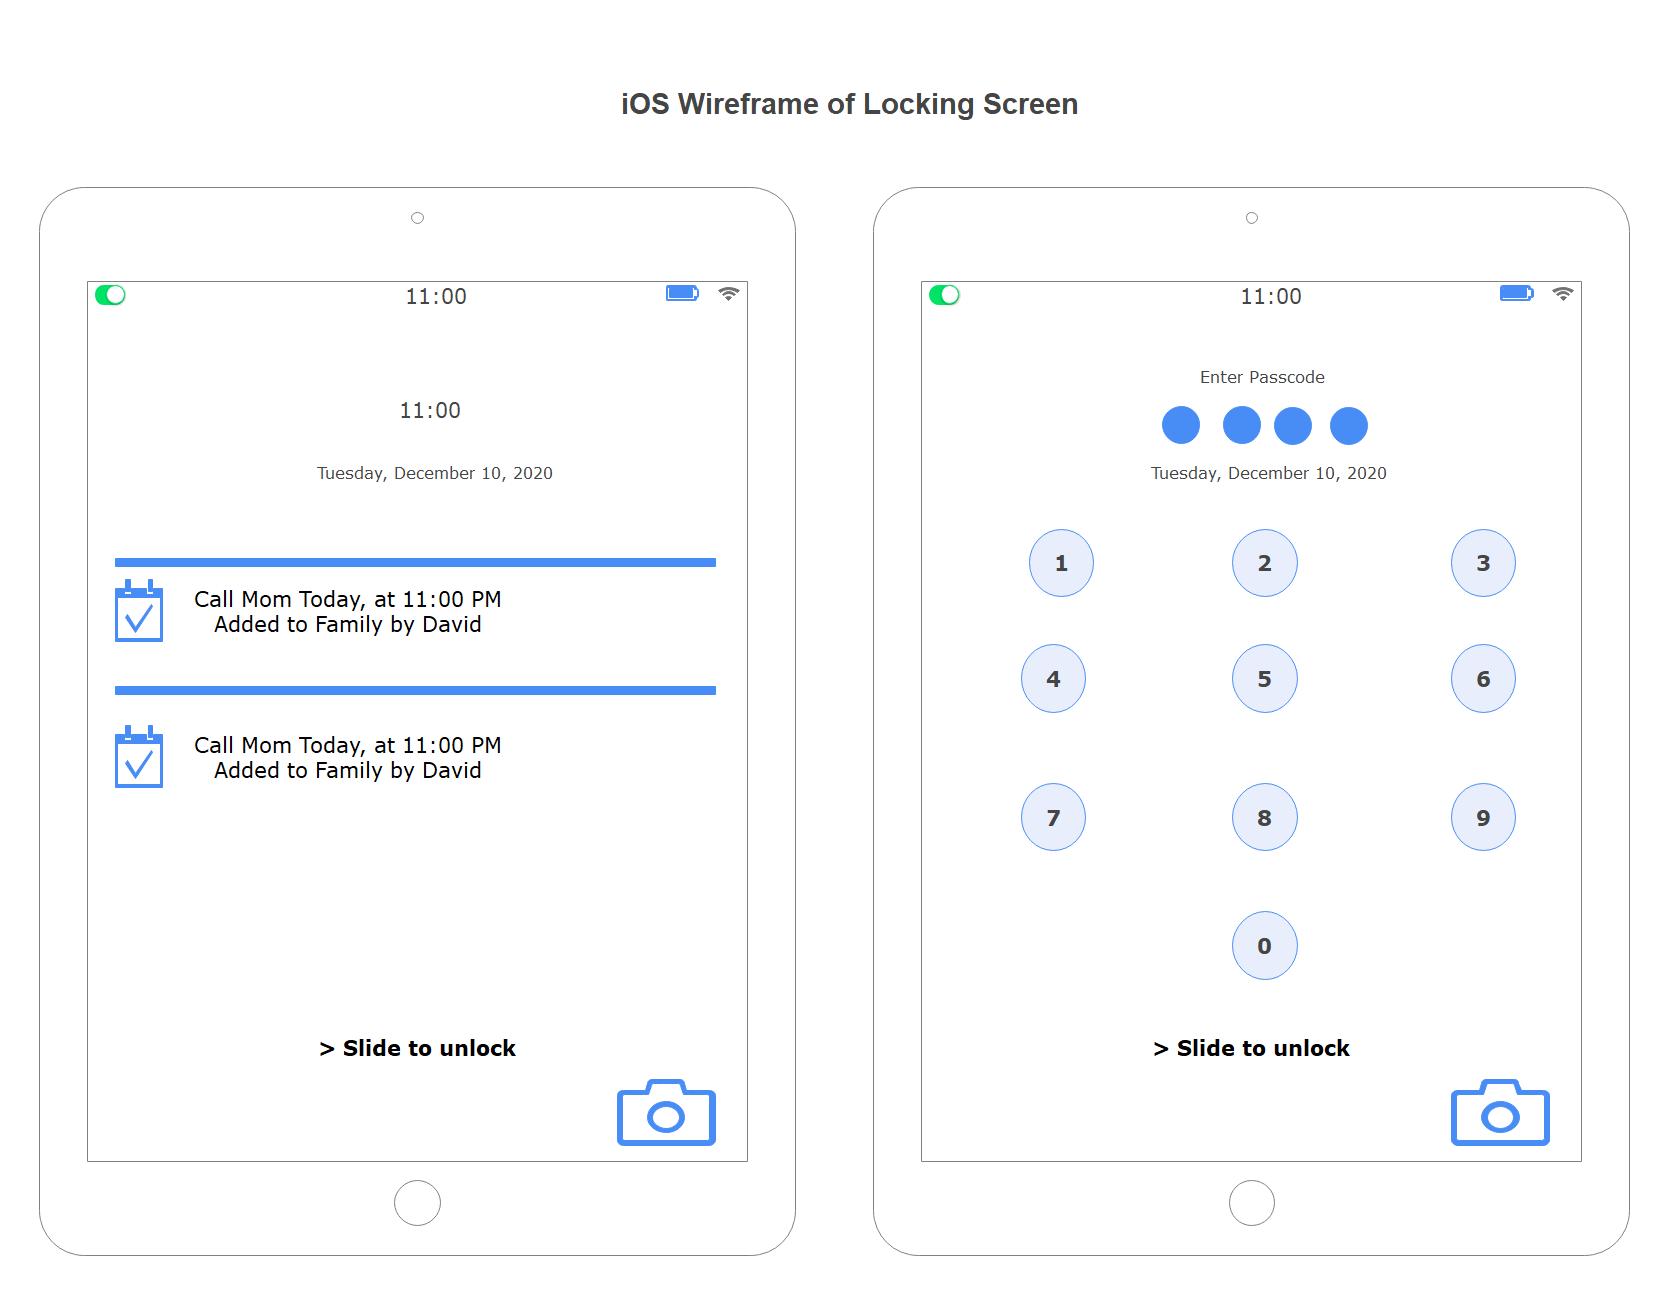 iOS Wireframe of Locking Screen